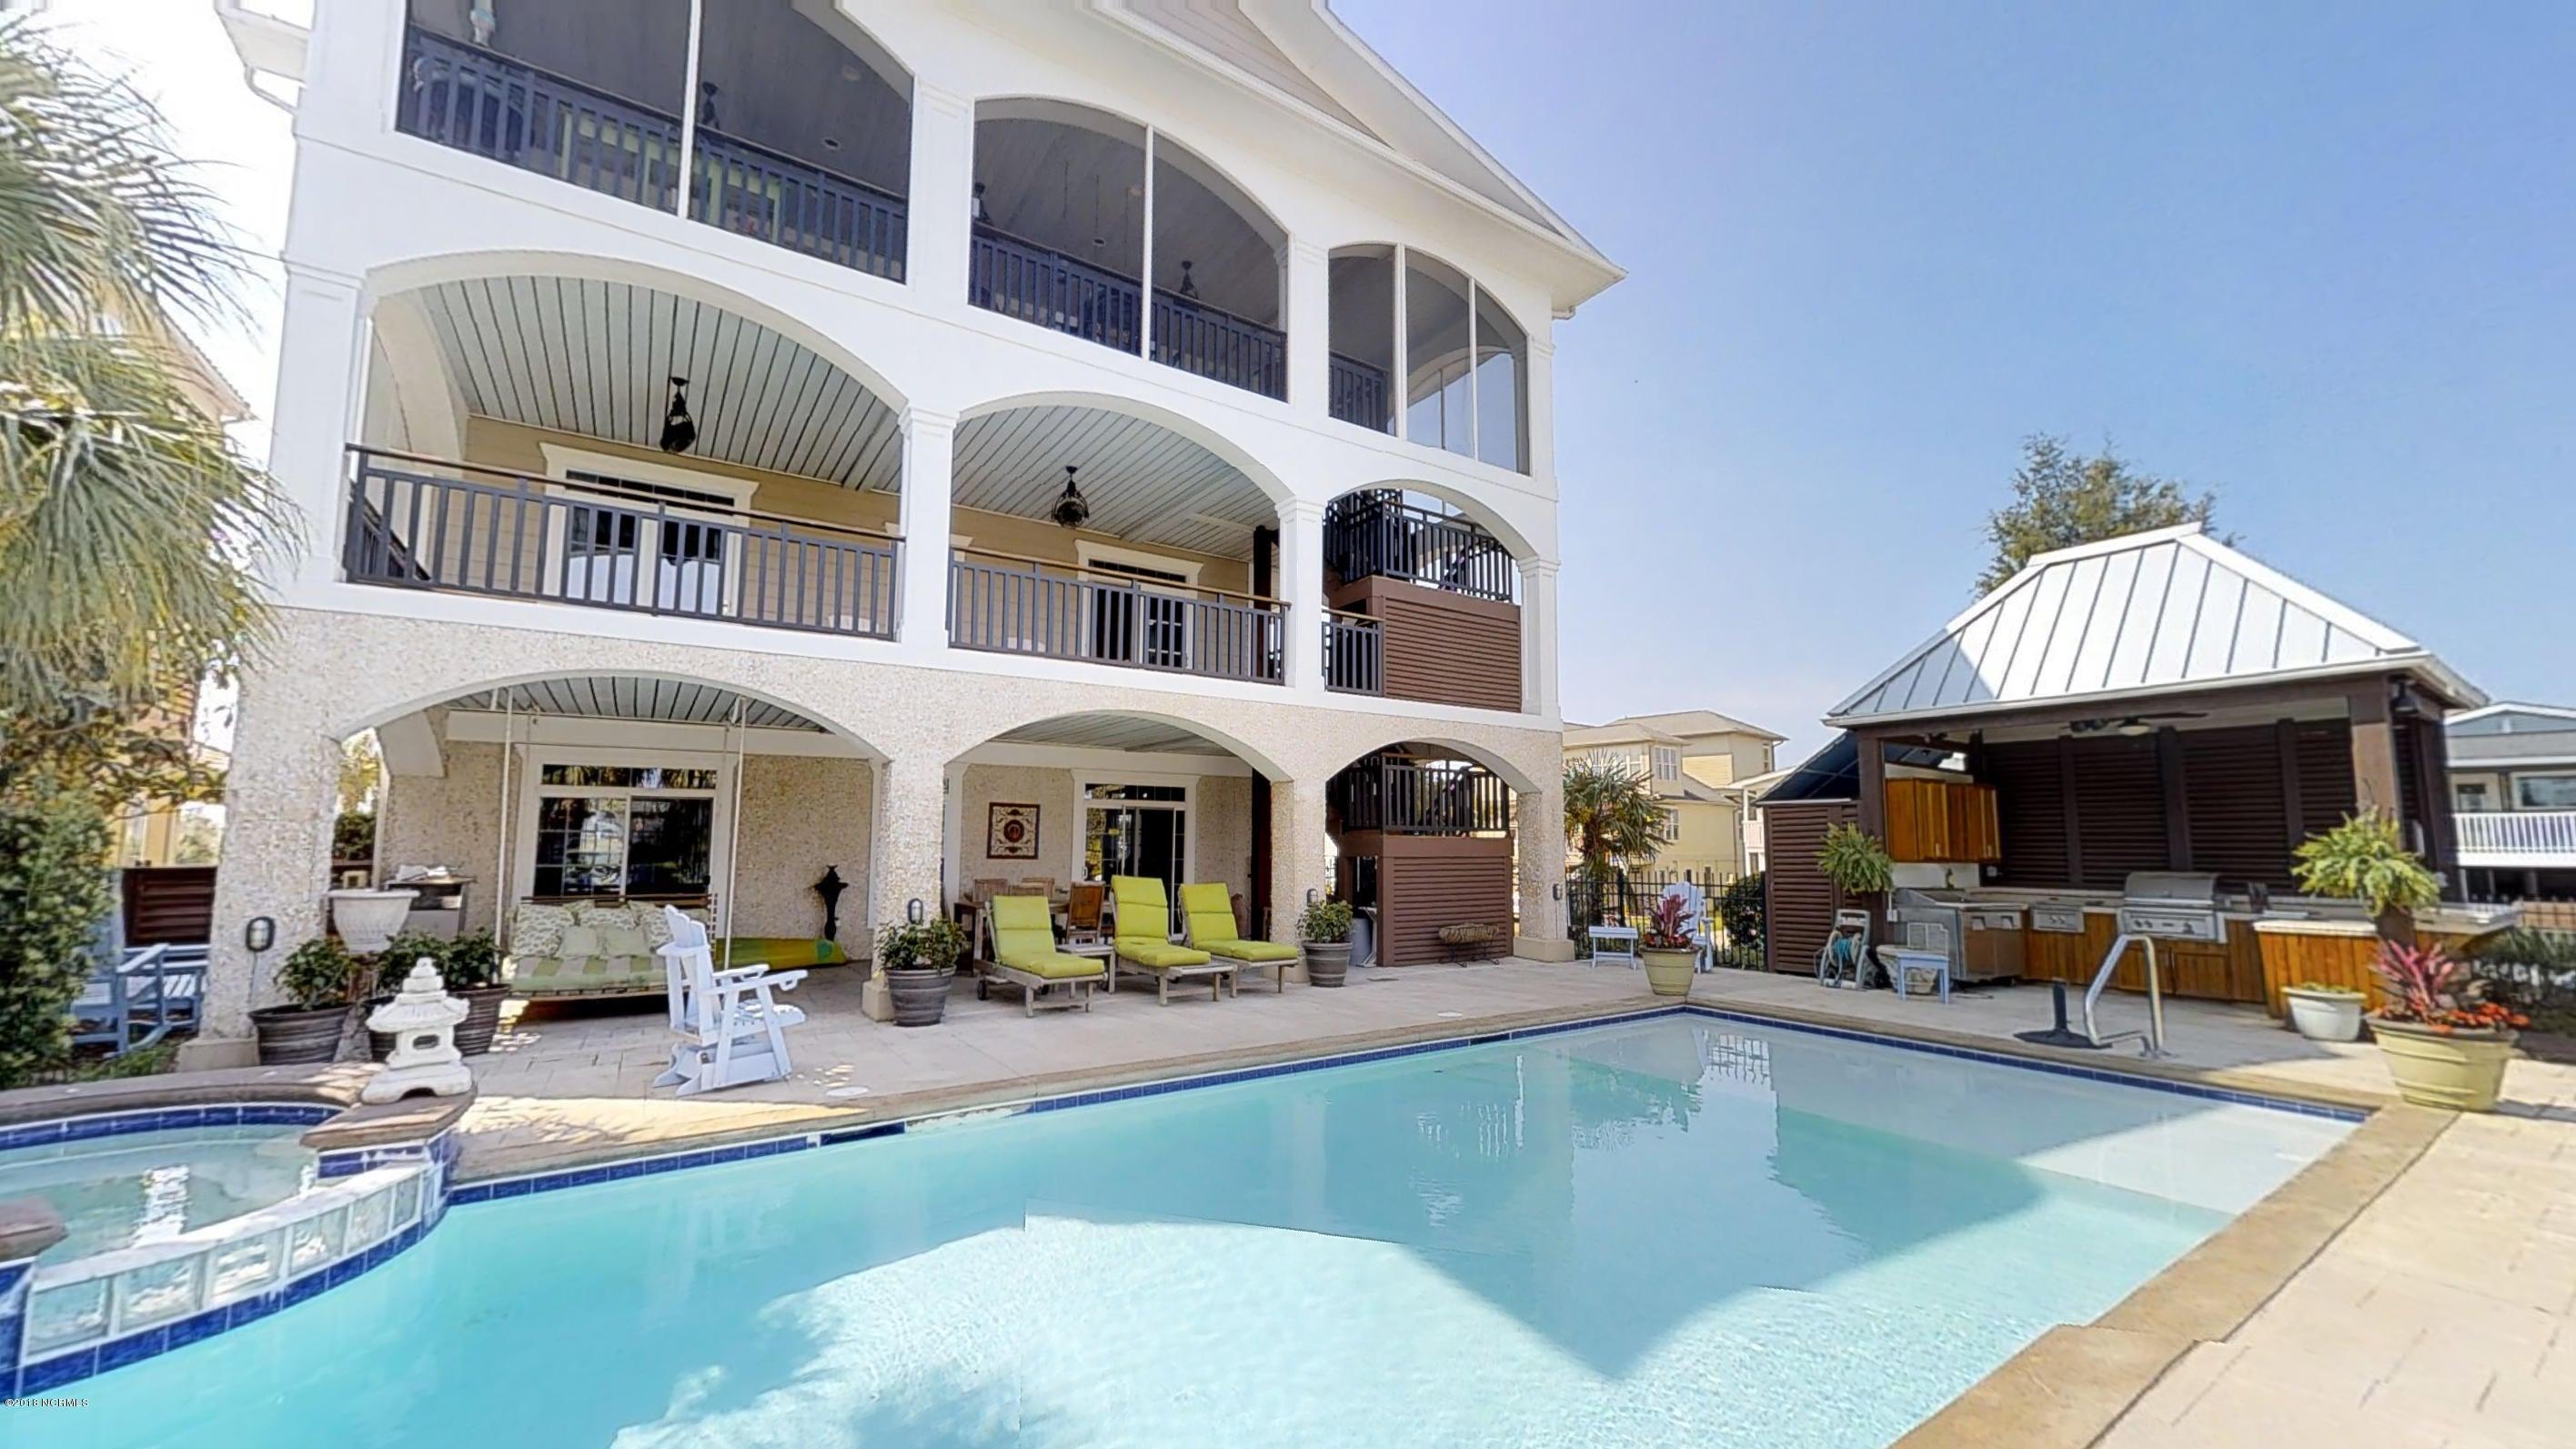 Ocean Isle Beach Real Estate - http://cdn.resize.sparkplatform.com/ncr/1024x768/true/20180414120446756617000000-o.jpg